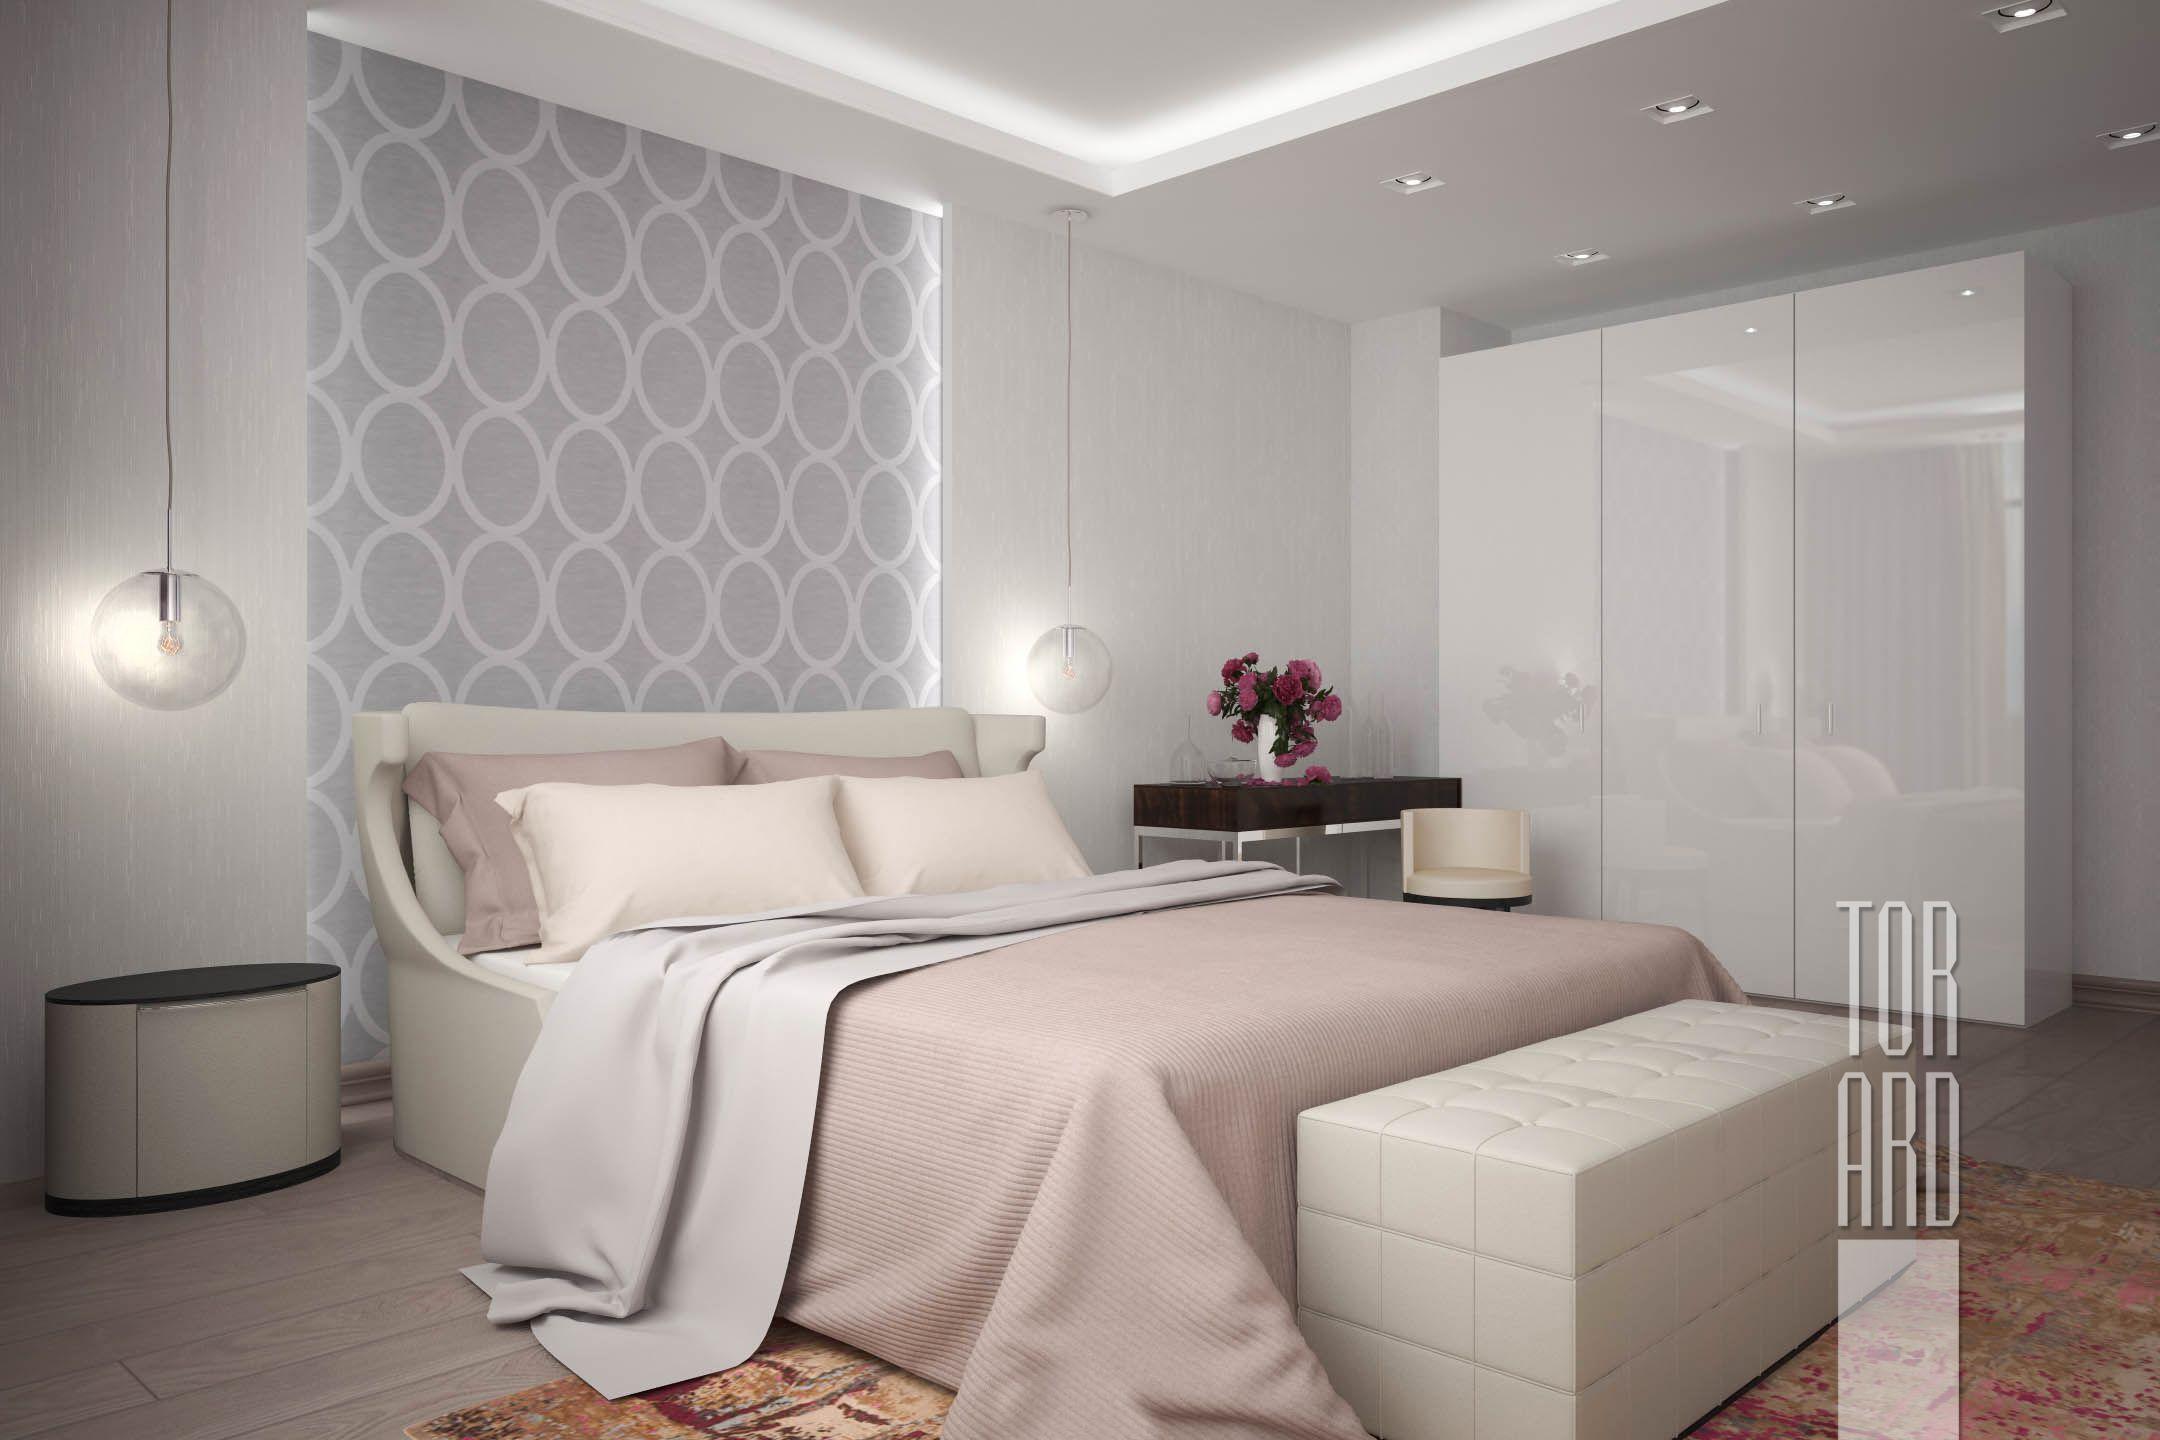 Apartment In Krasnogorsk Bathroom In English Design Small Bathroom Design